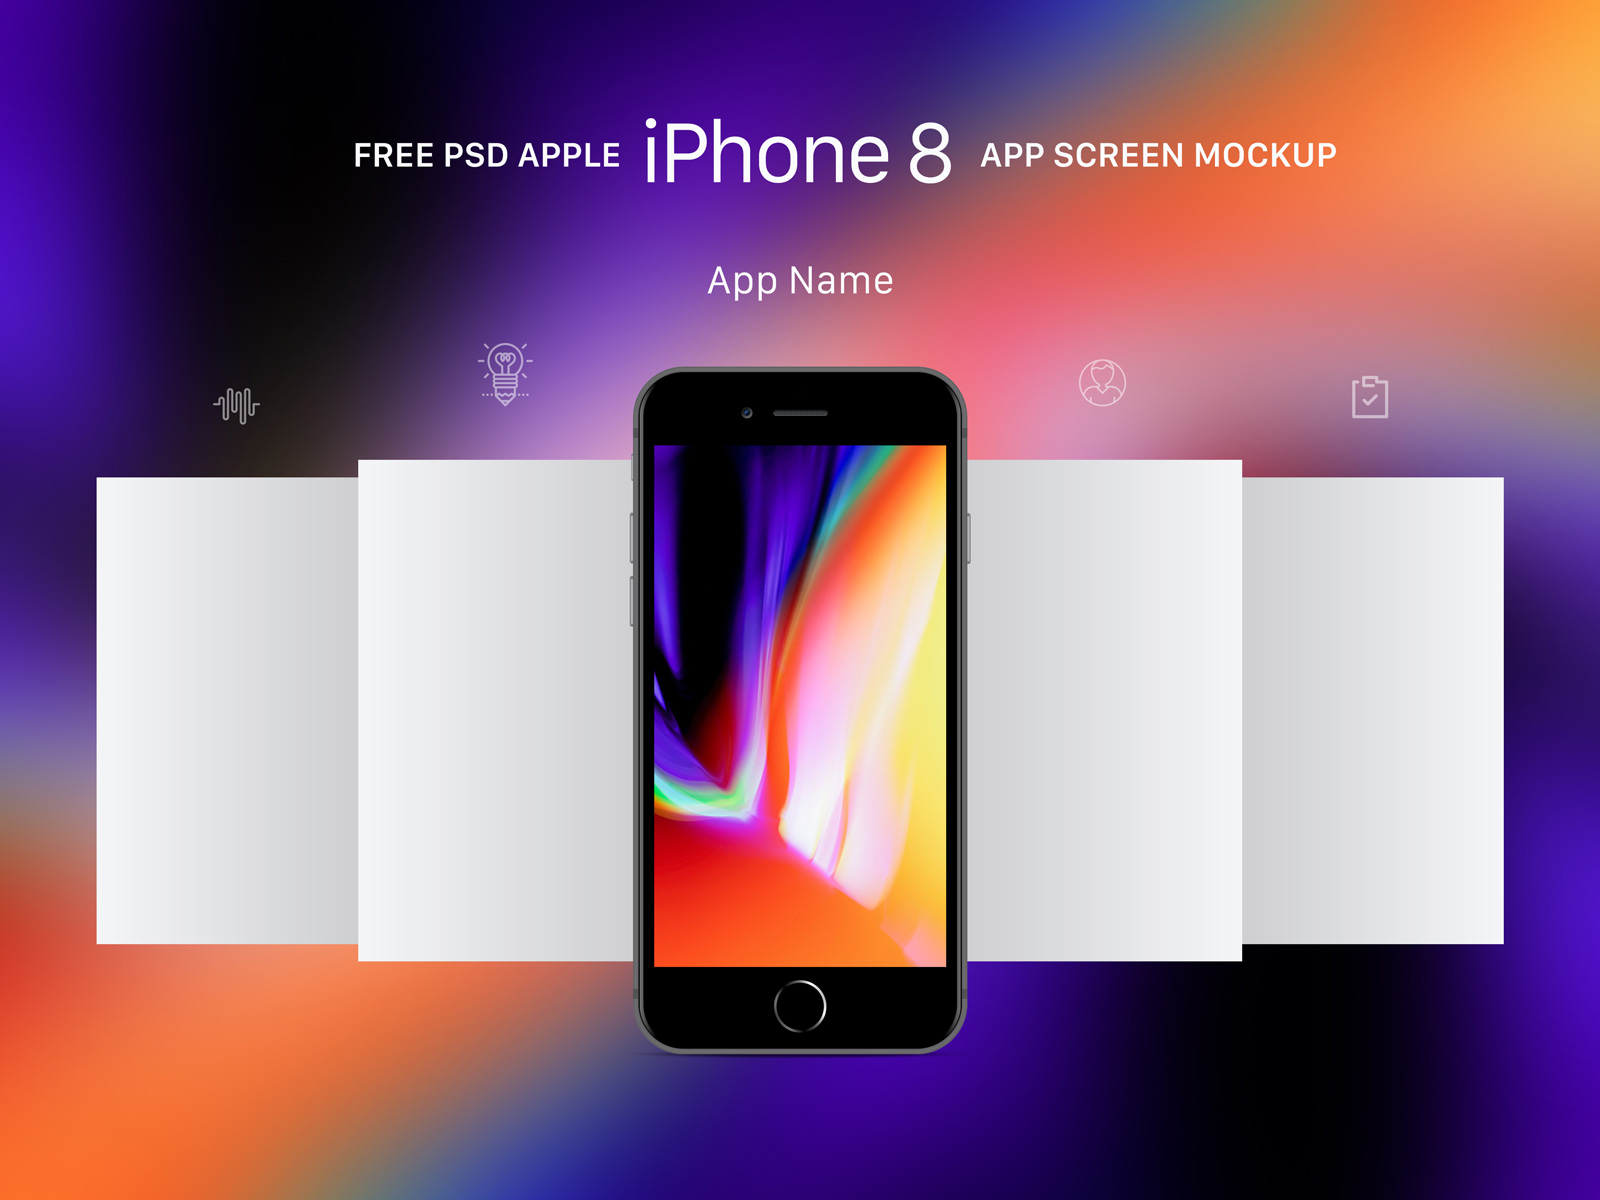 Free-Apple-Space-Gray-iPhone-8-App-Screen-Mockup-PSD